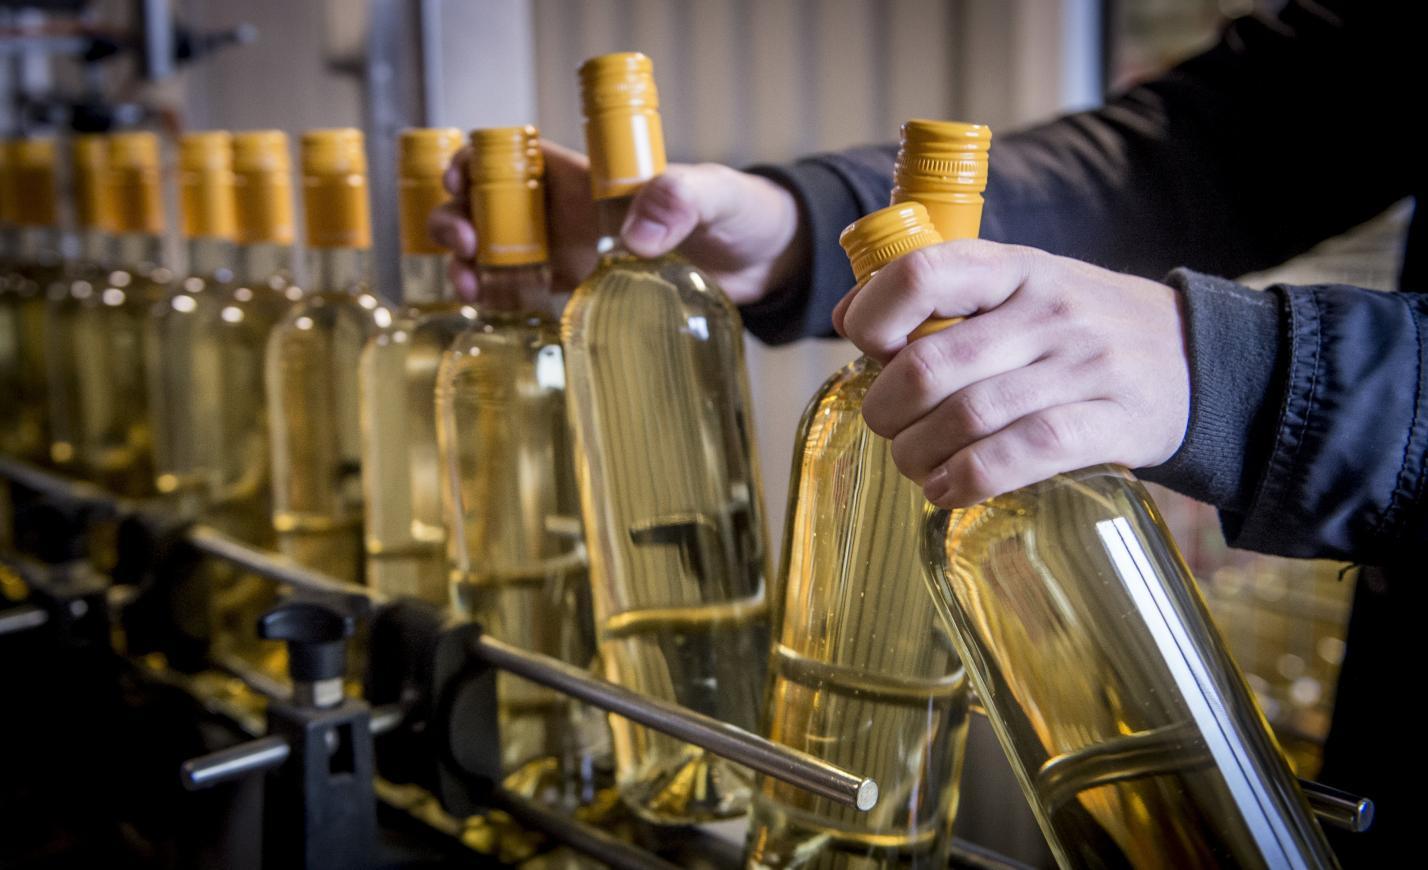 Oltalom alatt a Soltvadkerti borok